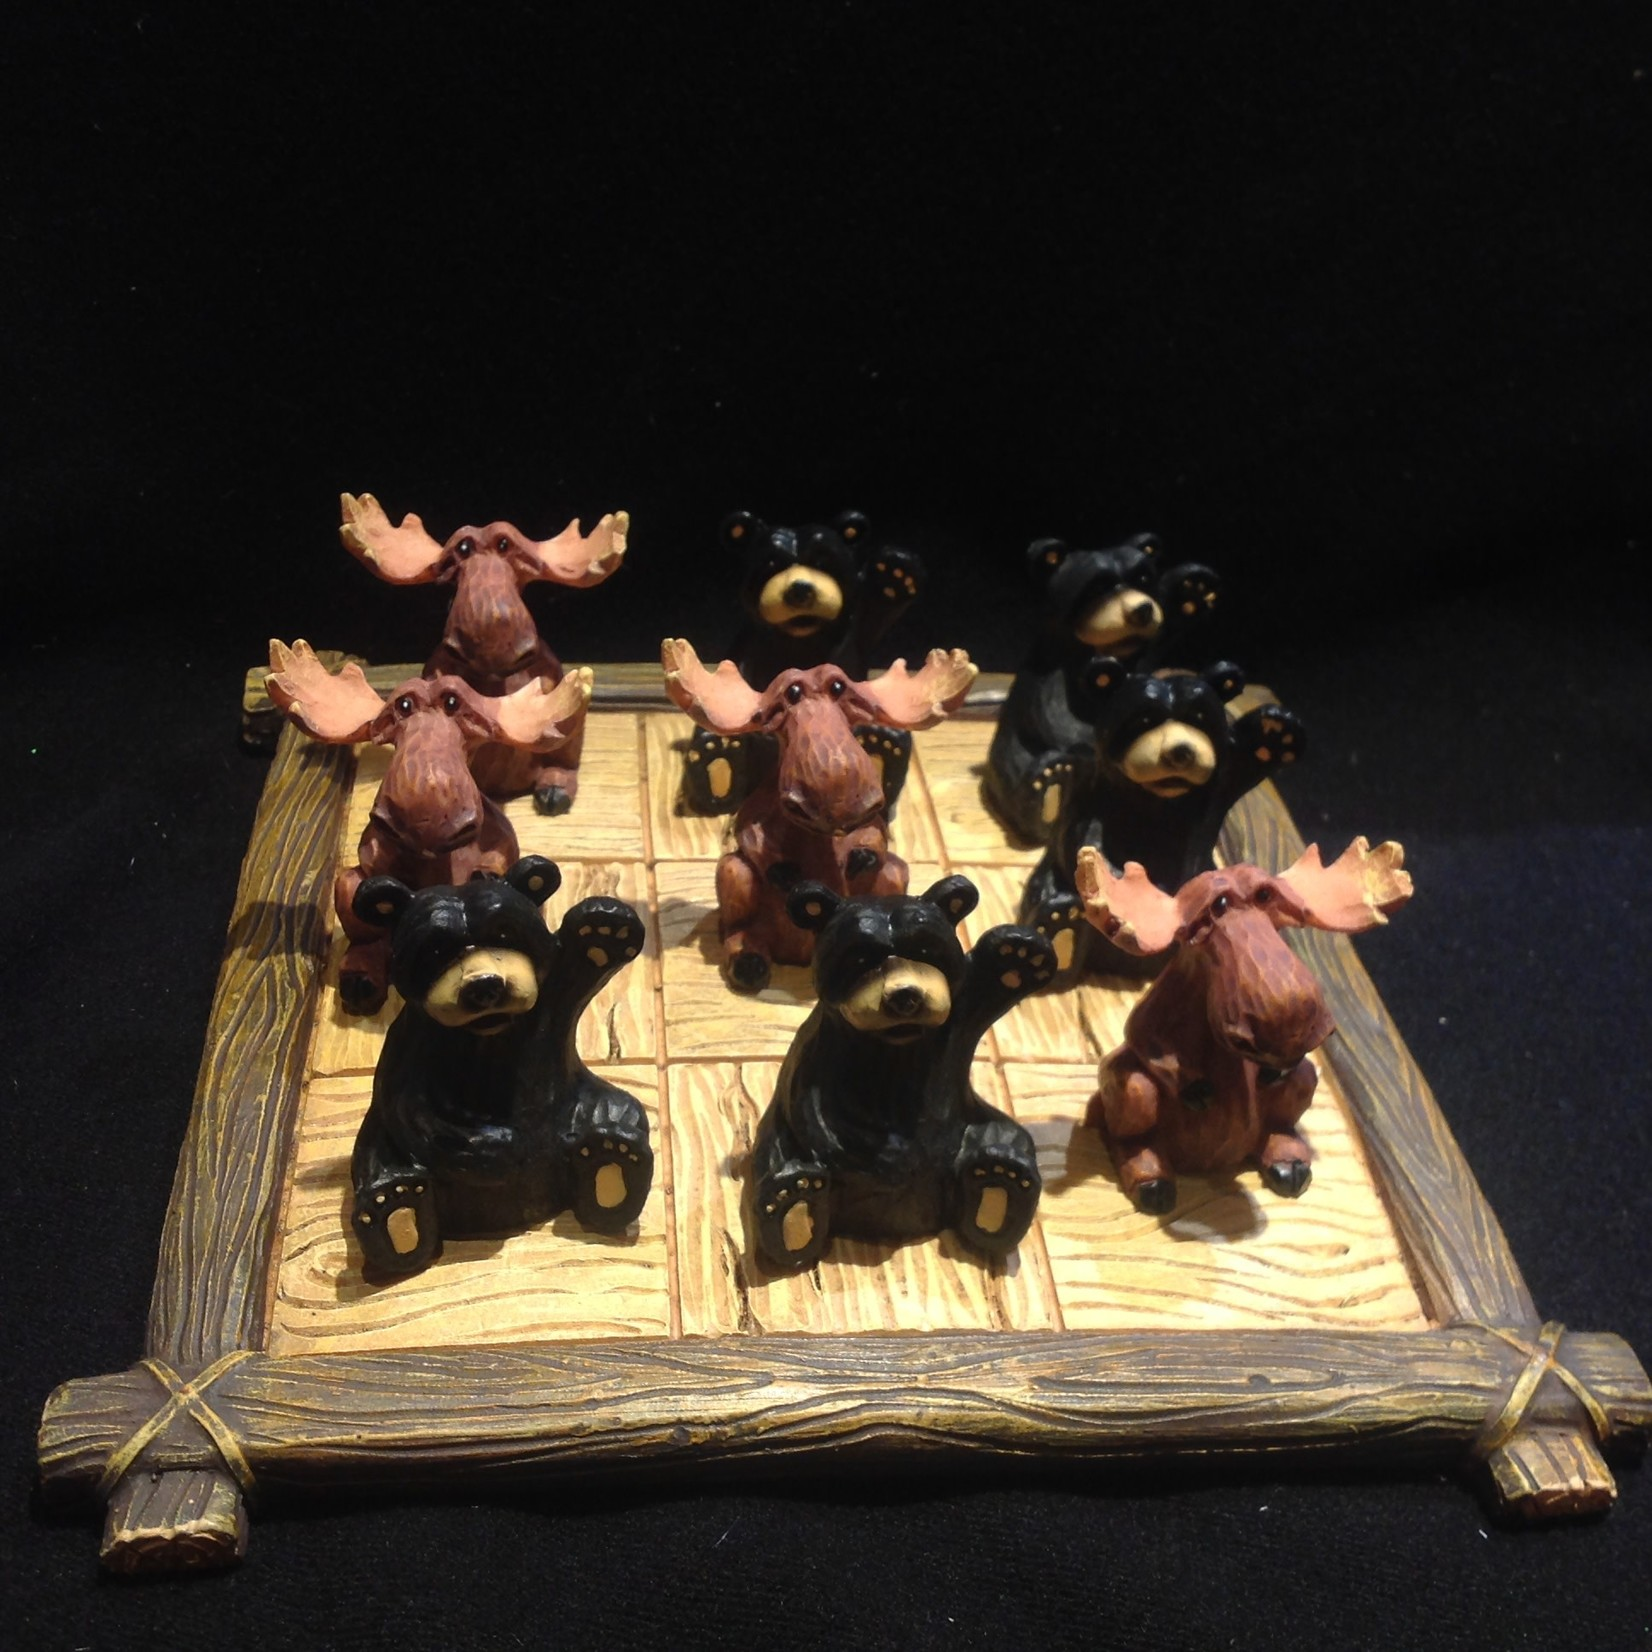 Bear & Moose Tic Tac Toe Set